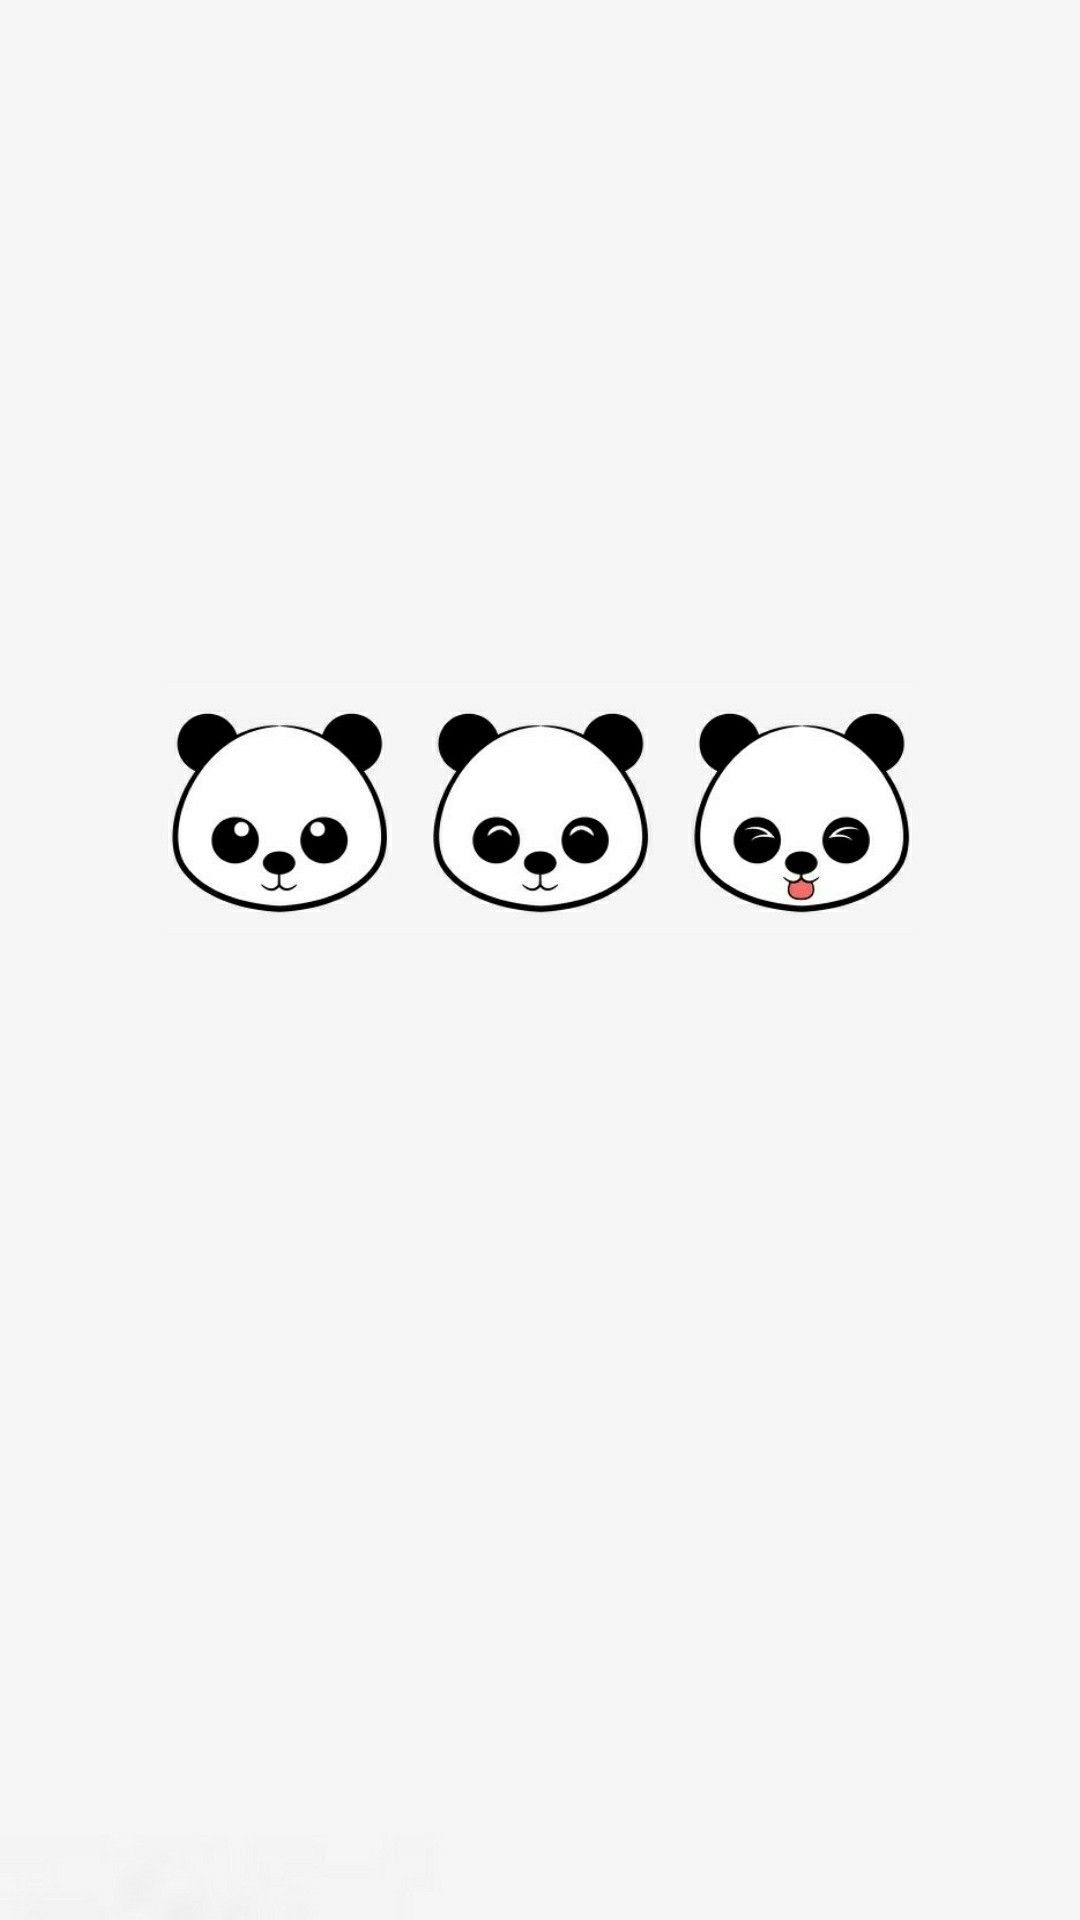 Pin By Aisya Putri On Papeis Cute Panda Wallpaper Panda Wallpapers Panda Background